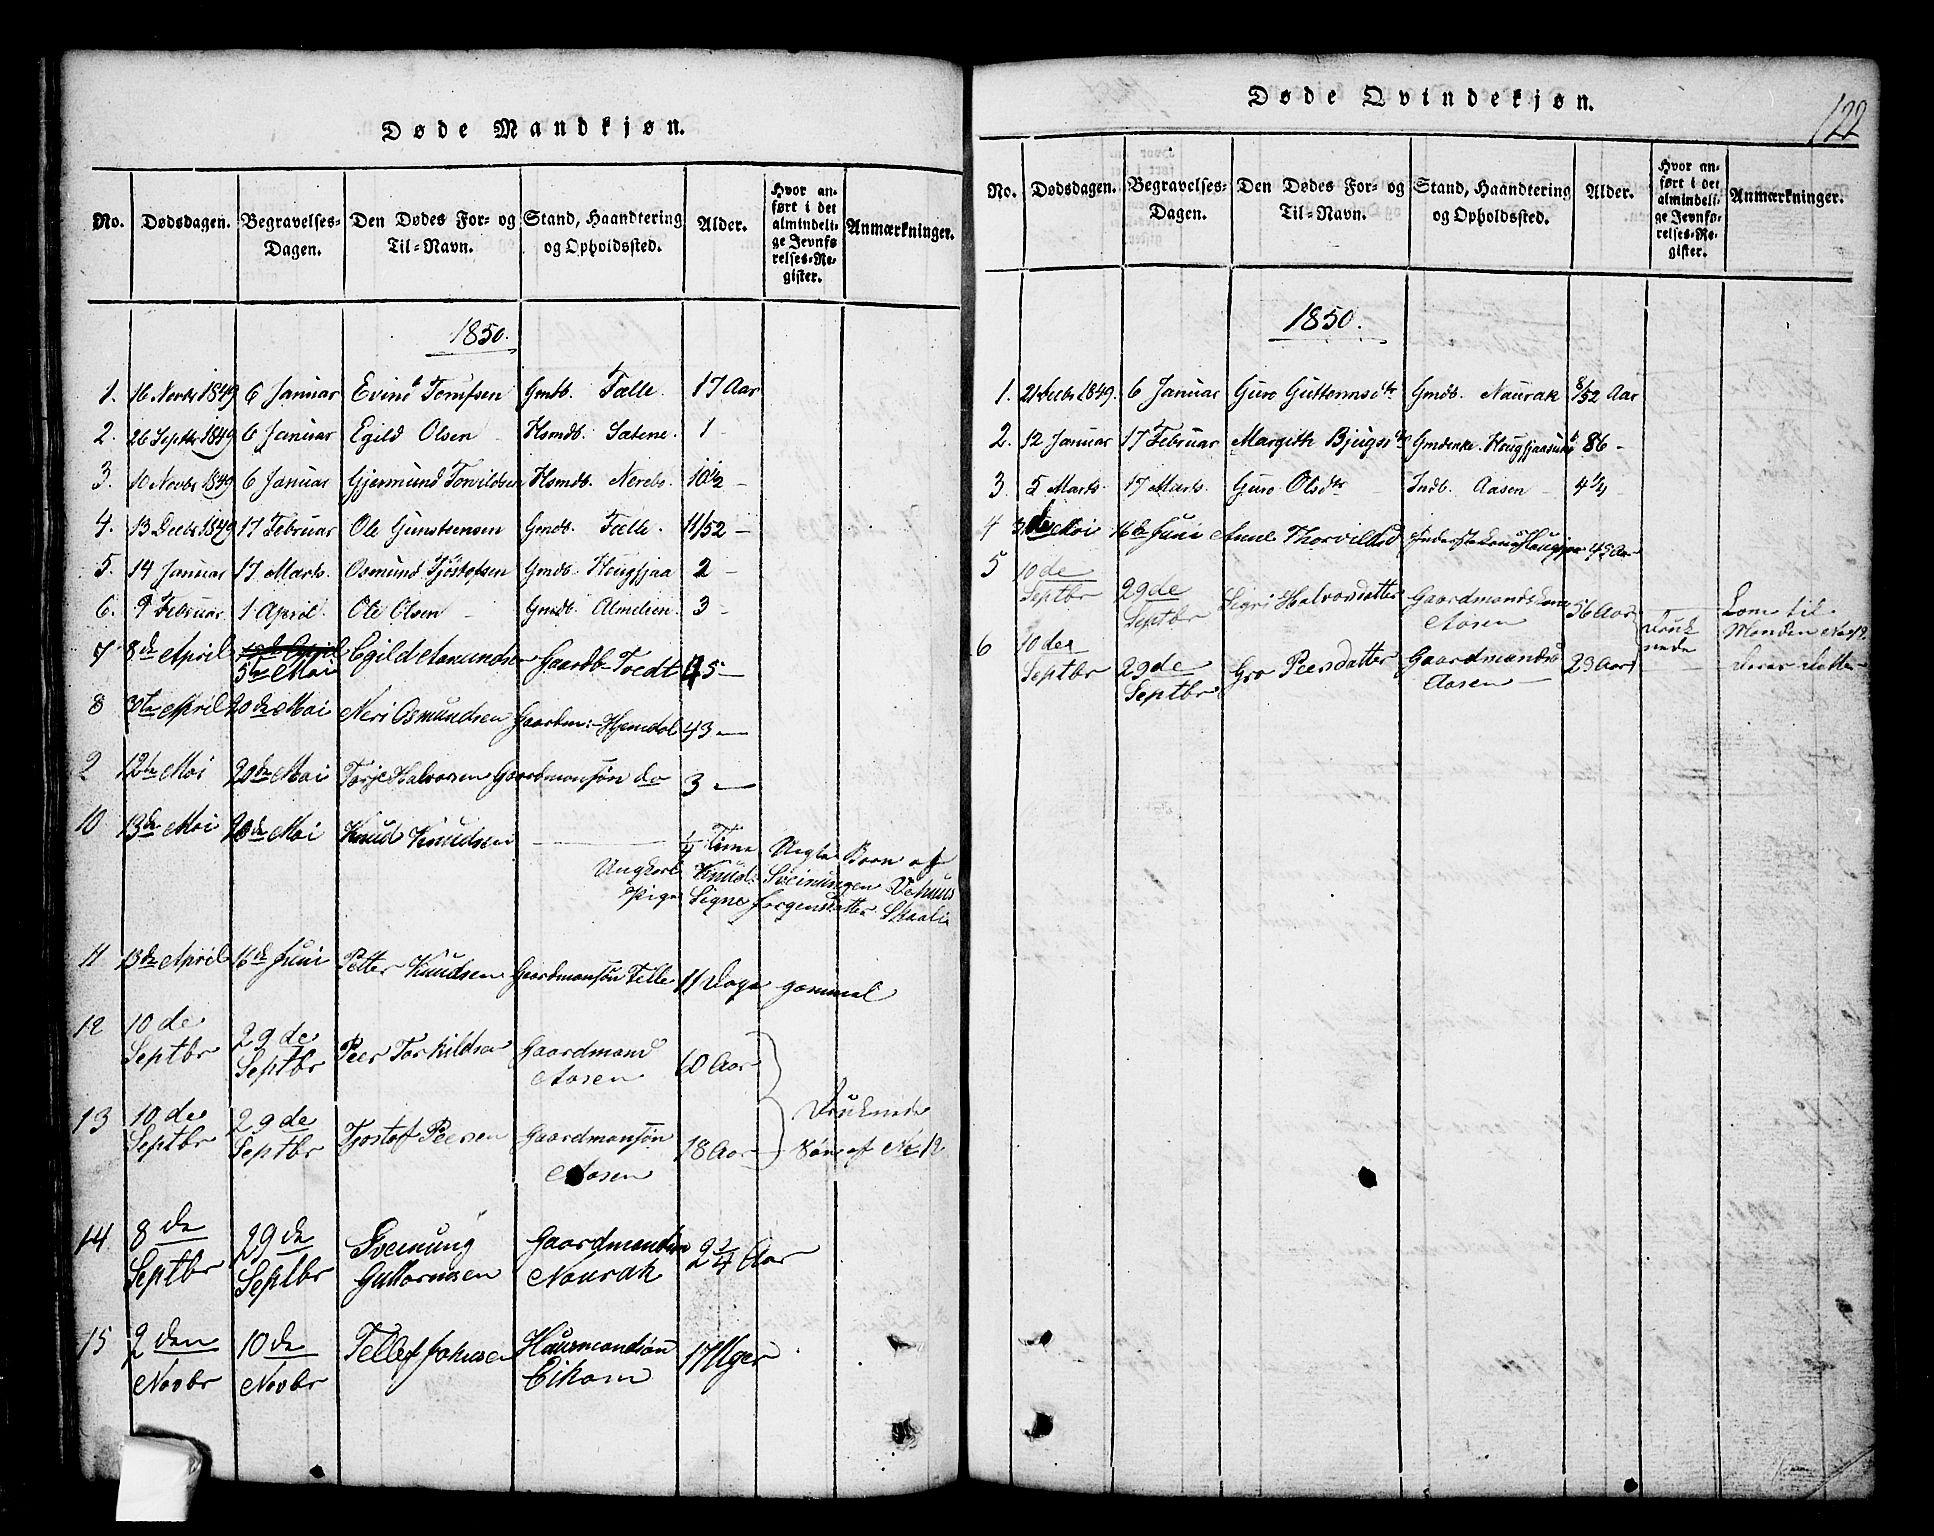 SAKO, Nissedal kirkebøker, G/Gb/L0001: Klokkerbok nr. II 1, 1814-1862, s. 122